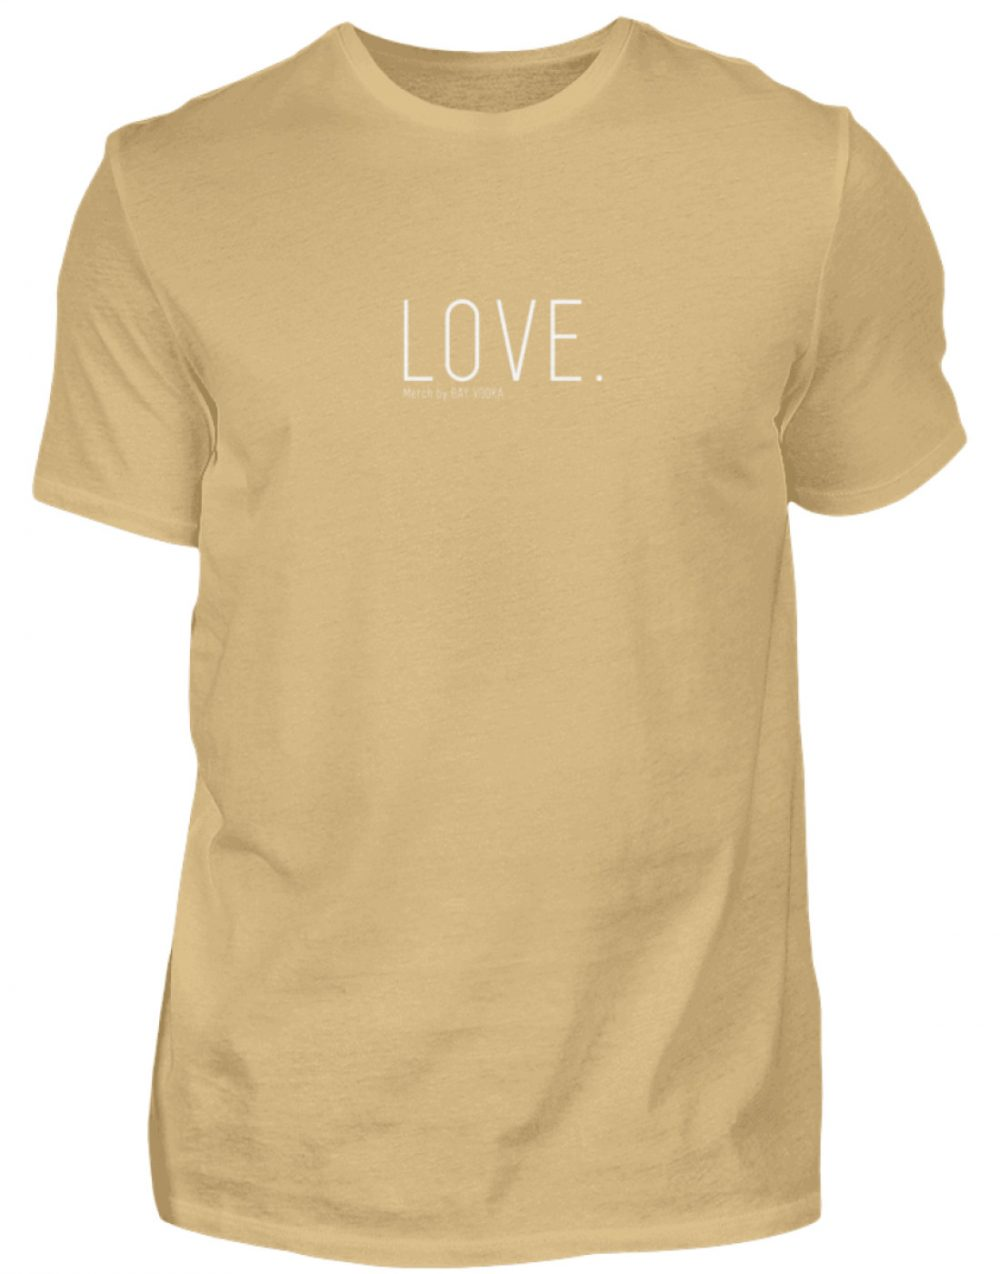 LOVE. - Herren Shirt-224